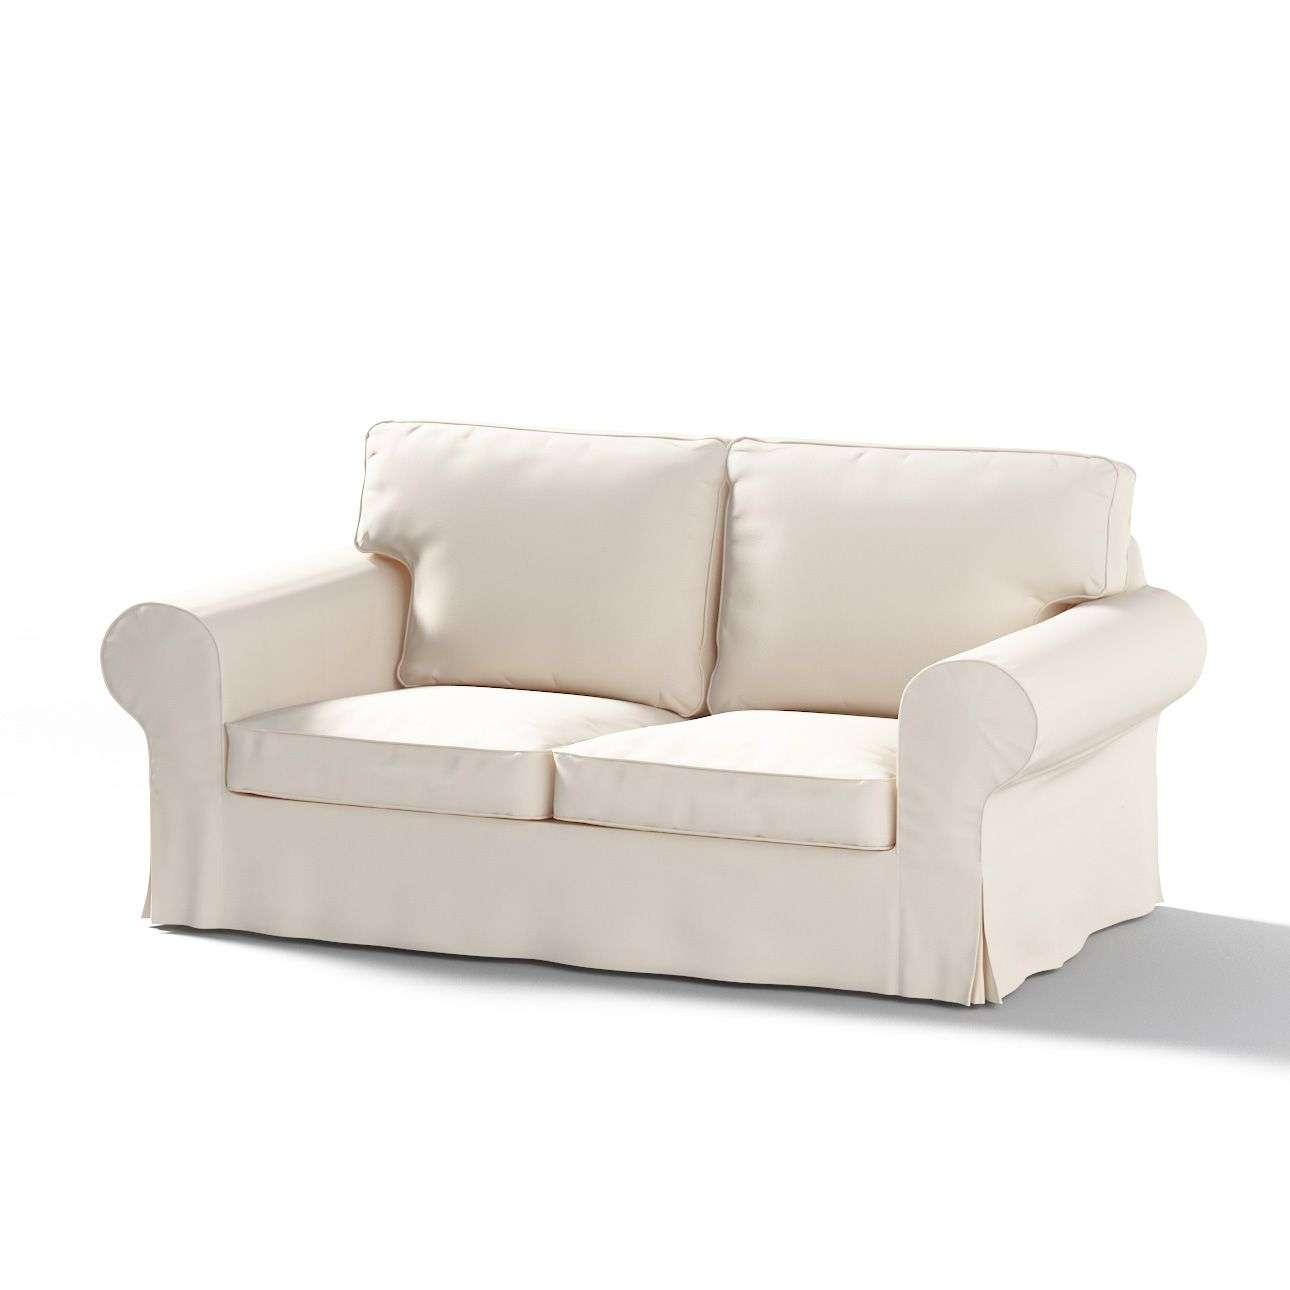 ikea sofa bef reclining sectional sofas ektorp and furniture covers dekoria co uk